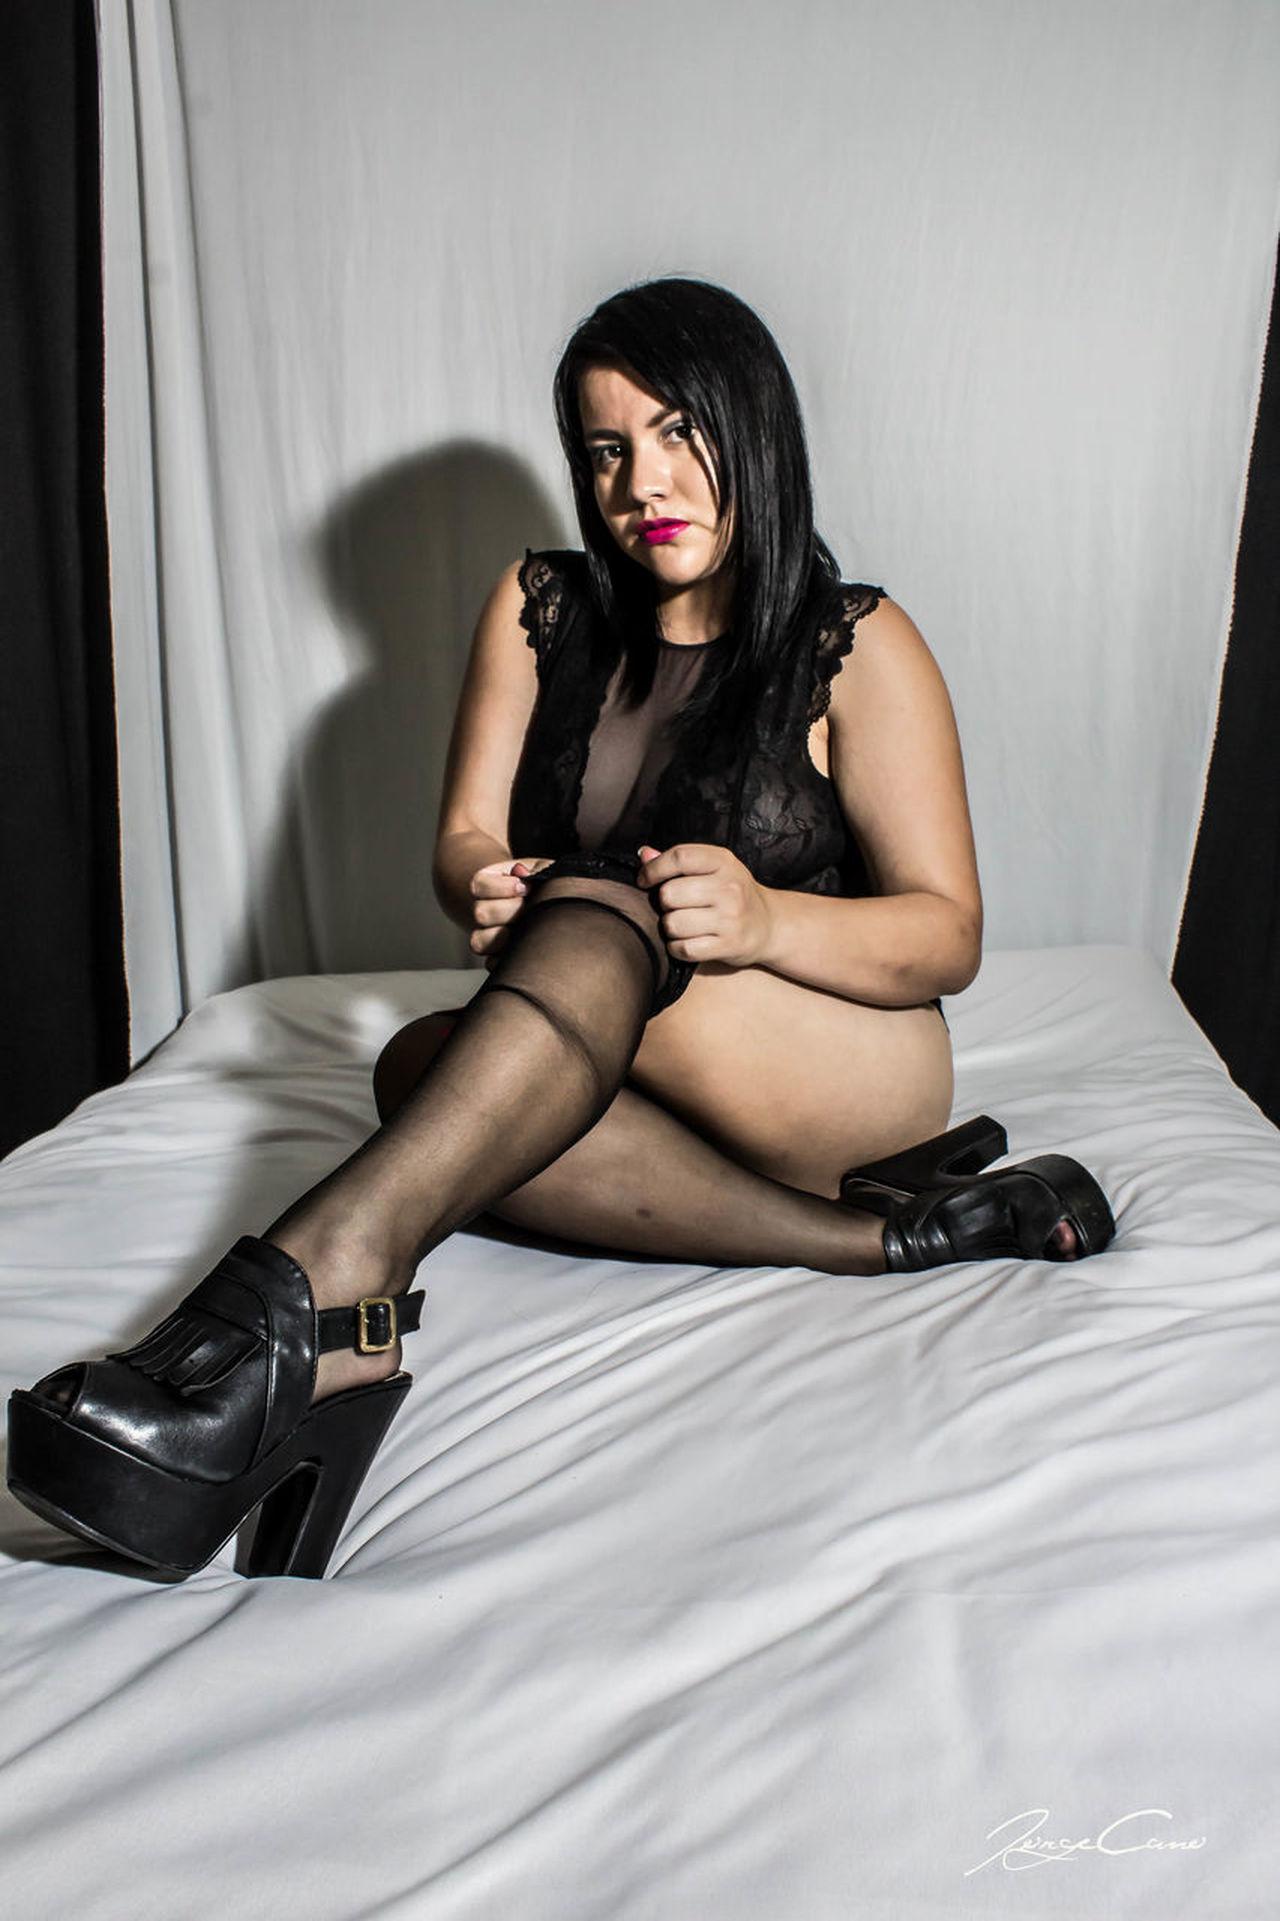 Hi! Arte Hello World SDHestudio Erotic_photo Noches Erotic_model